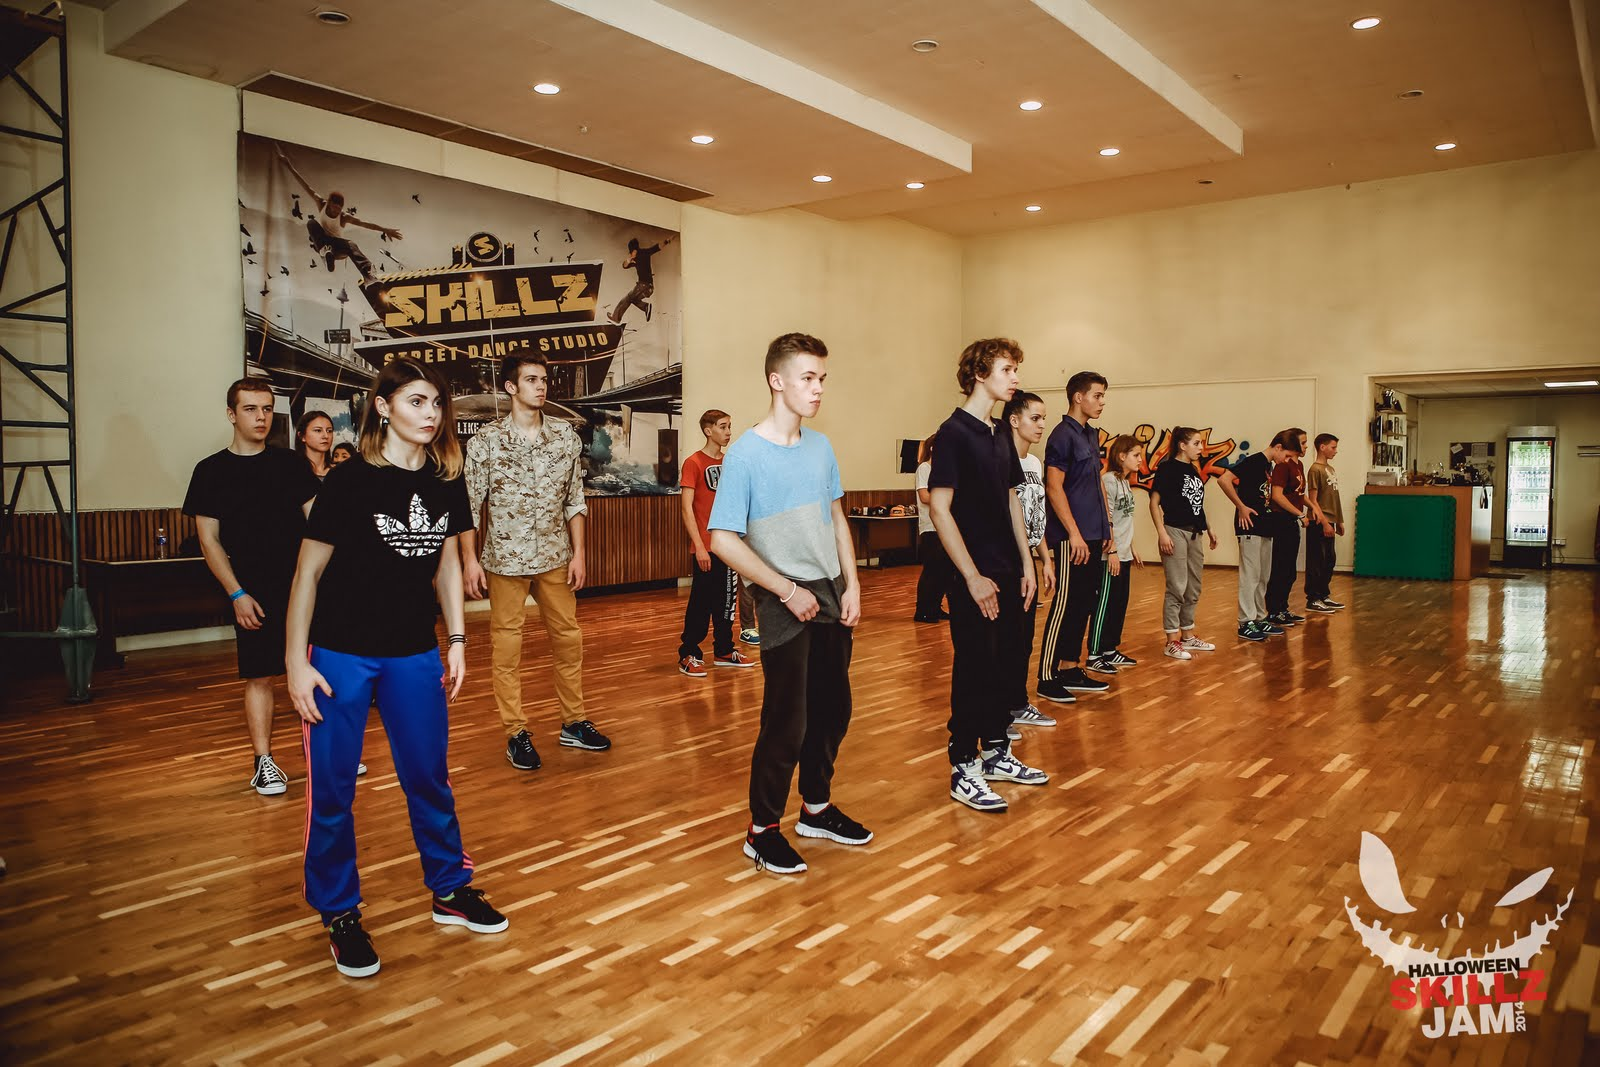 Šokių seminarai su Bouboo, Kaczorex, Tanya, Marek - _MG_7345.jpg